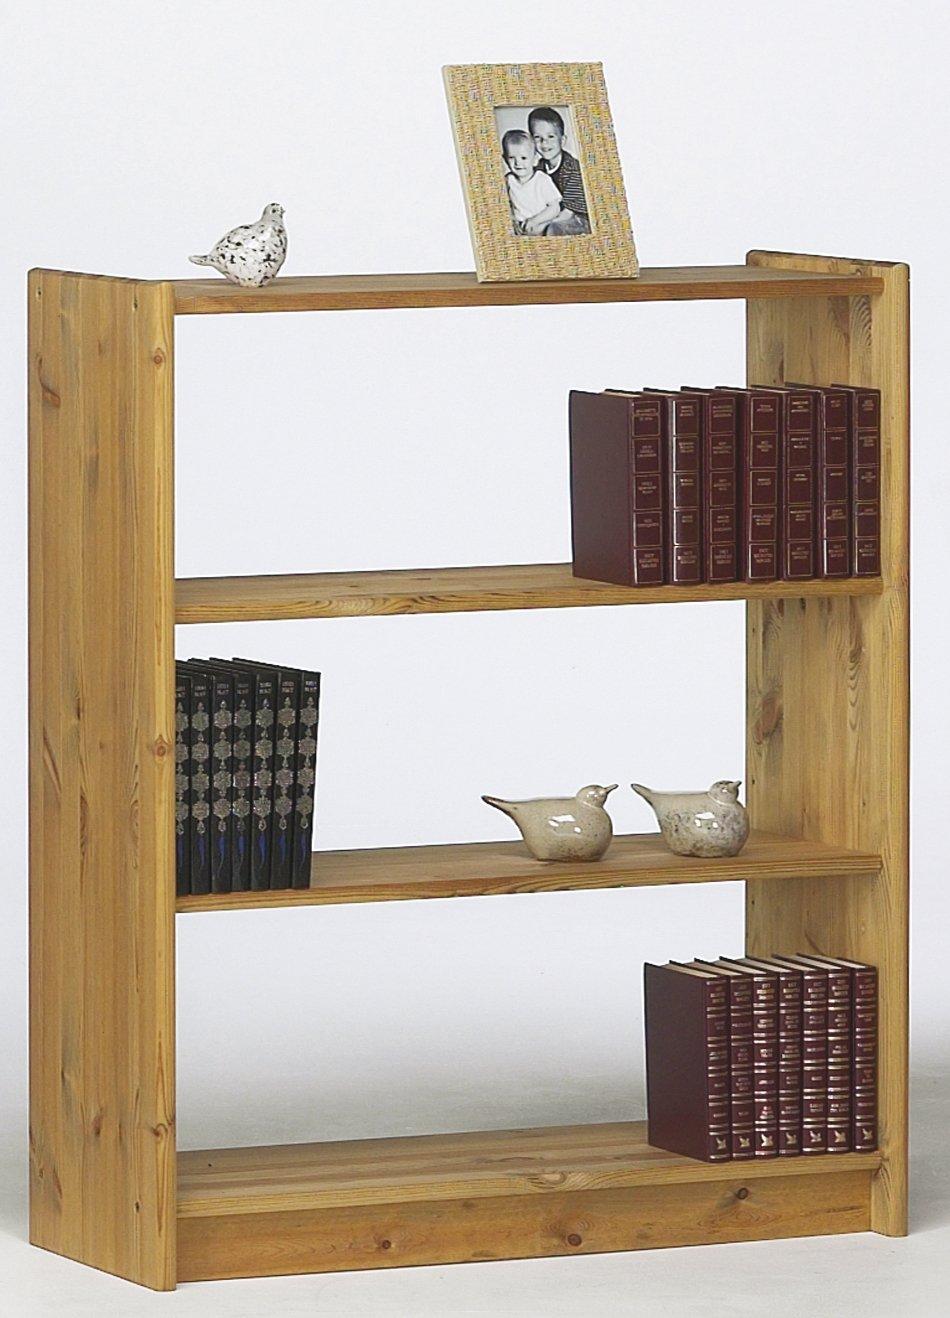 Steens AXEL Bücherregal, Kiefernholz mit 2 Regalböden, gelaugtes gelaugtes gelaugtes Ölfinish 6d821f